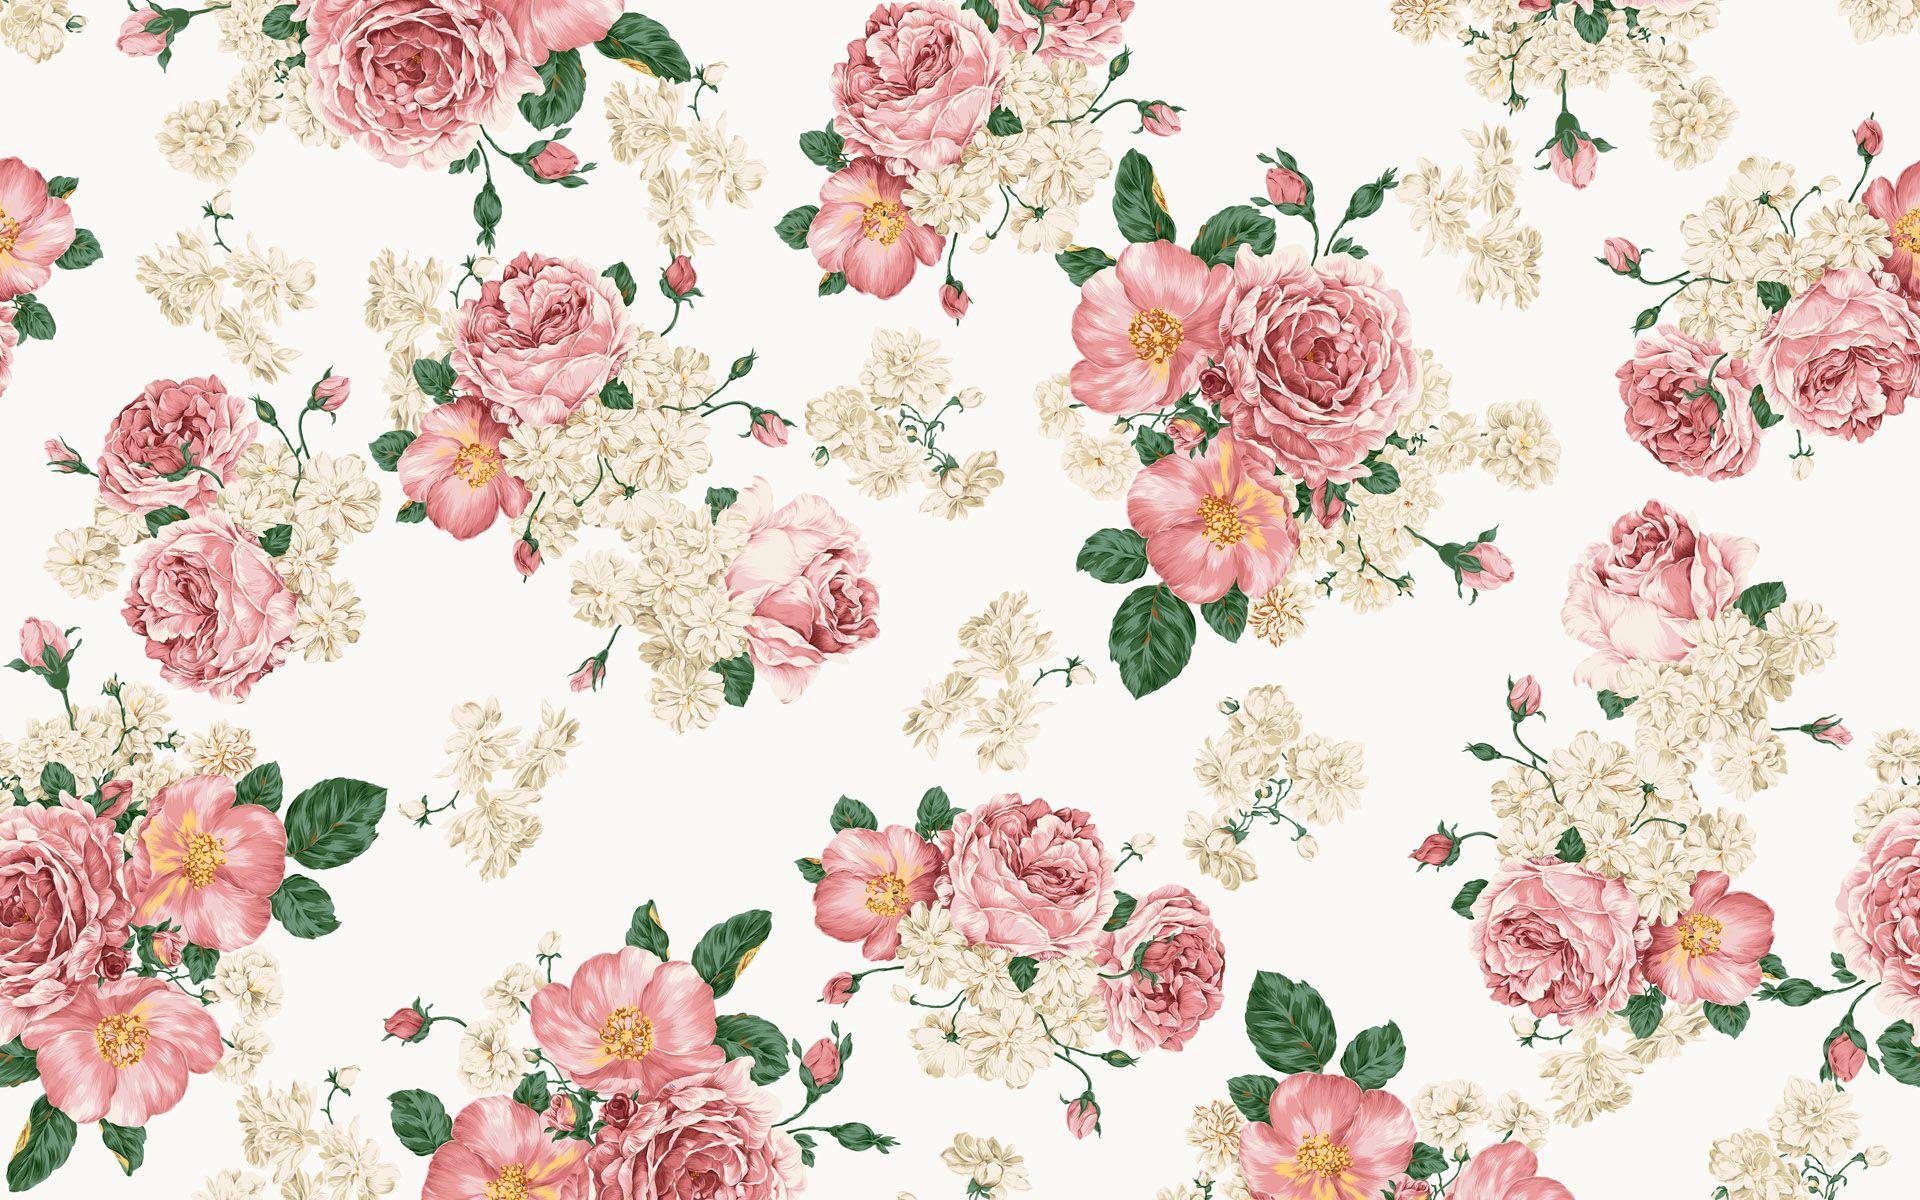 Flower Pattern 1920x1200 Vintage Flowers Wallpaper Vintage